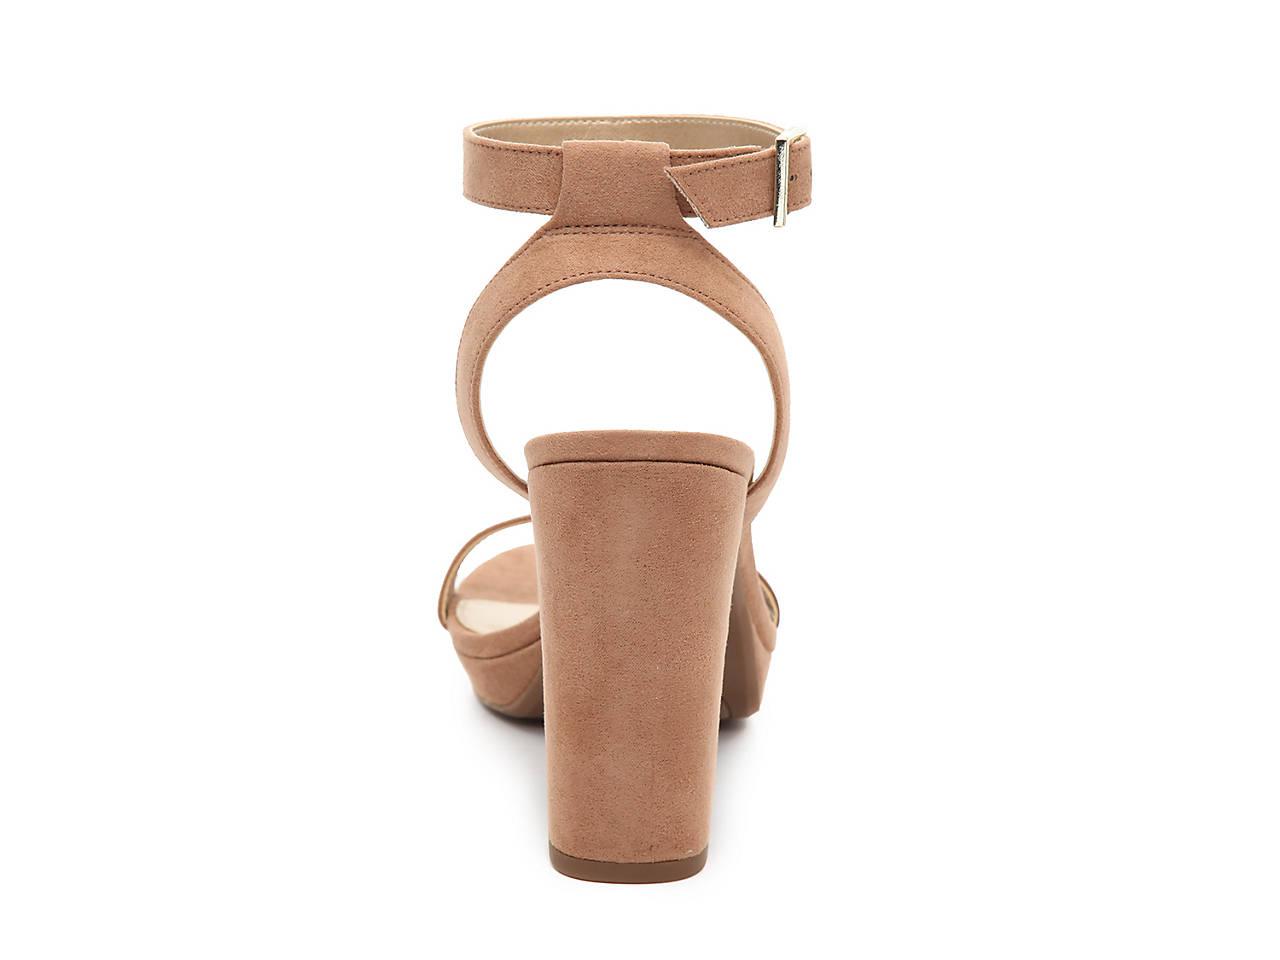 dd7b7f65e02 Circus by Sam Edelman Abigal Platform Sandal Women s Shoes